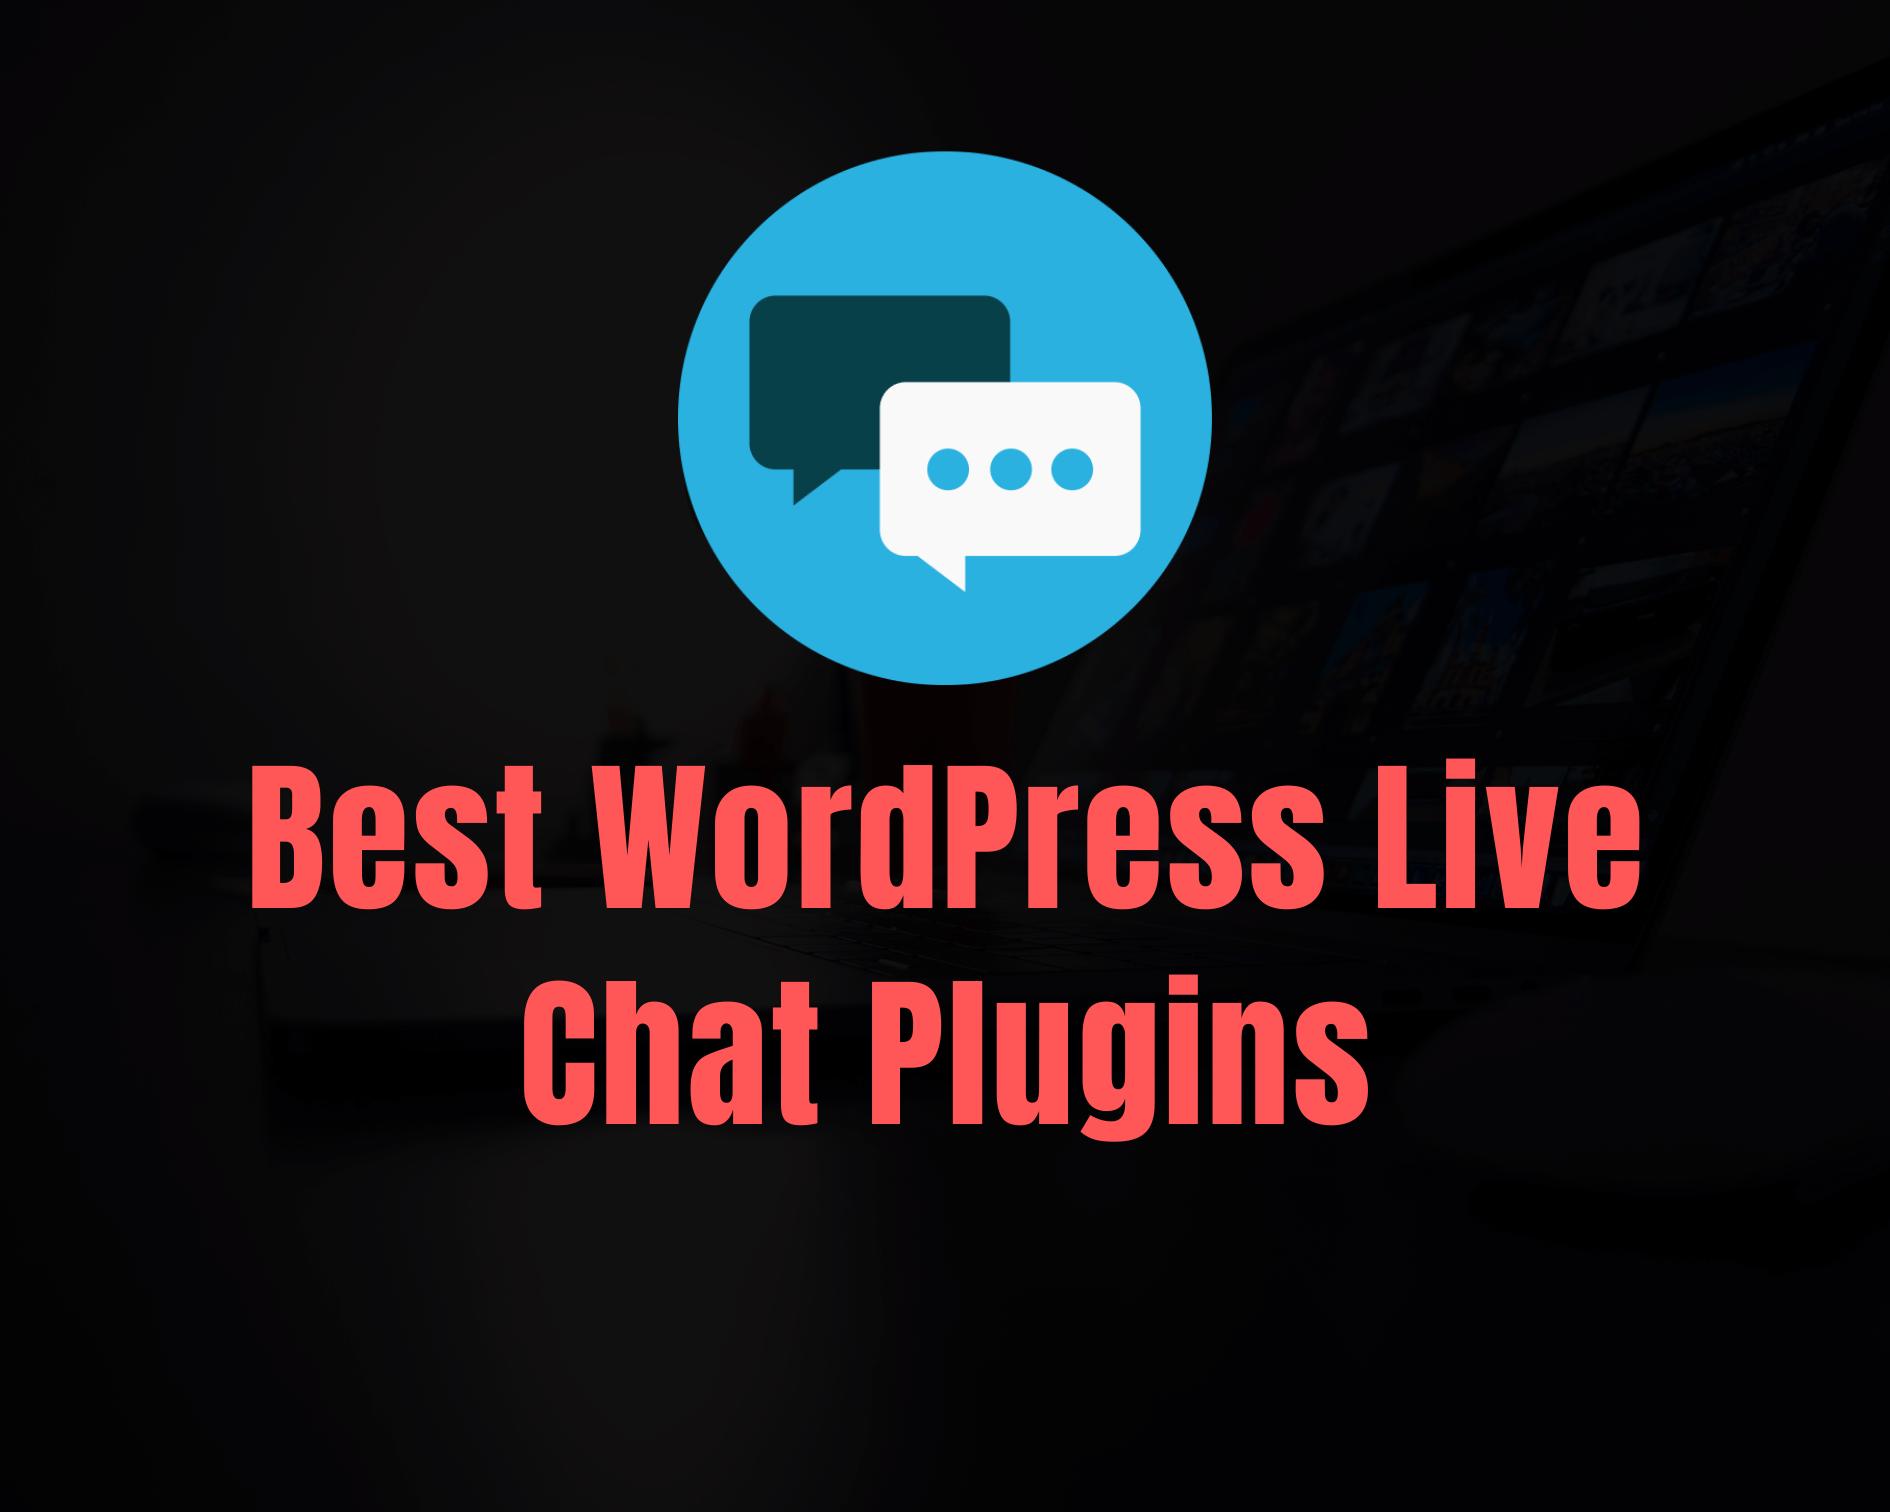 Top 7 WordPress Live Chat Plugins in 2021